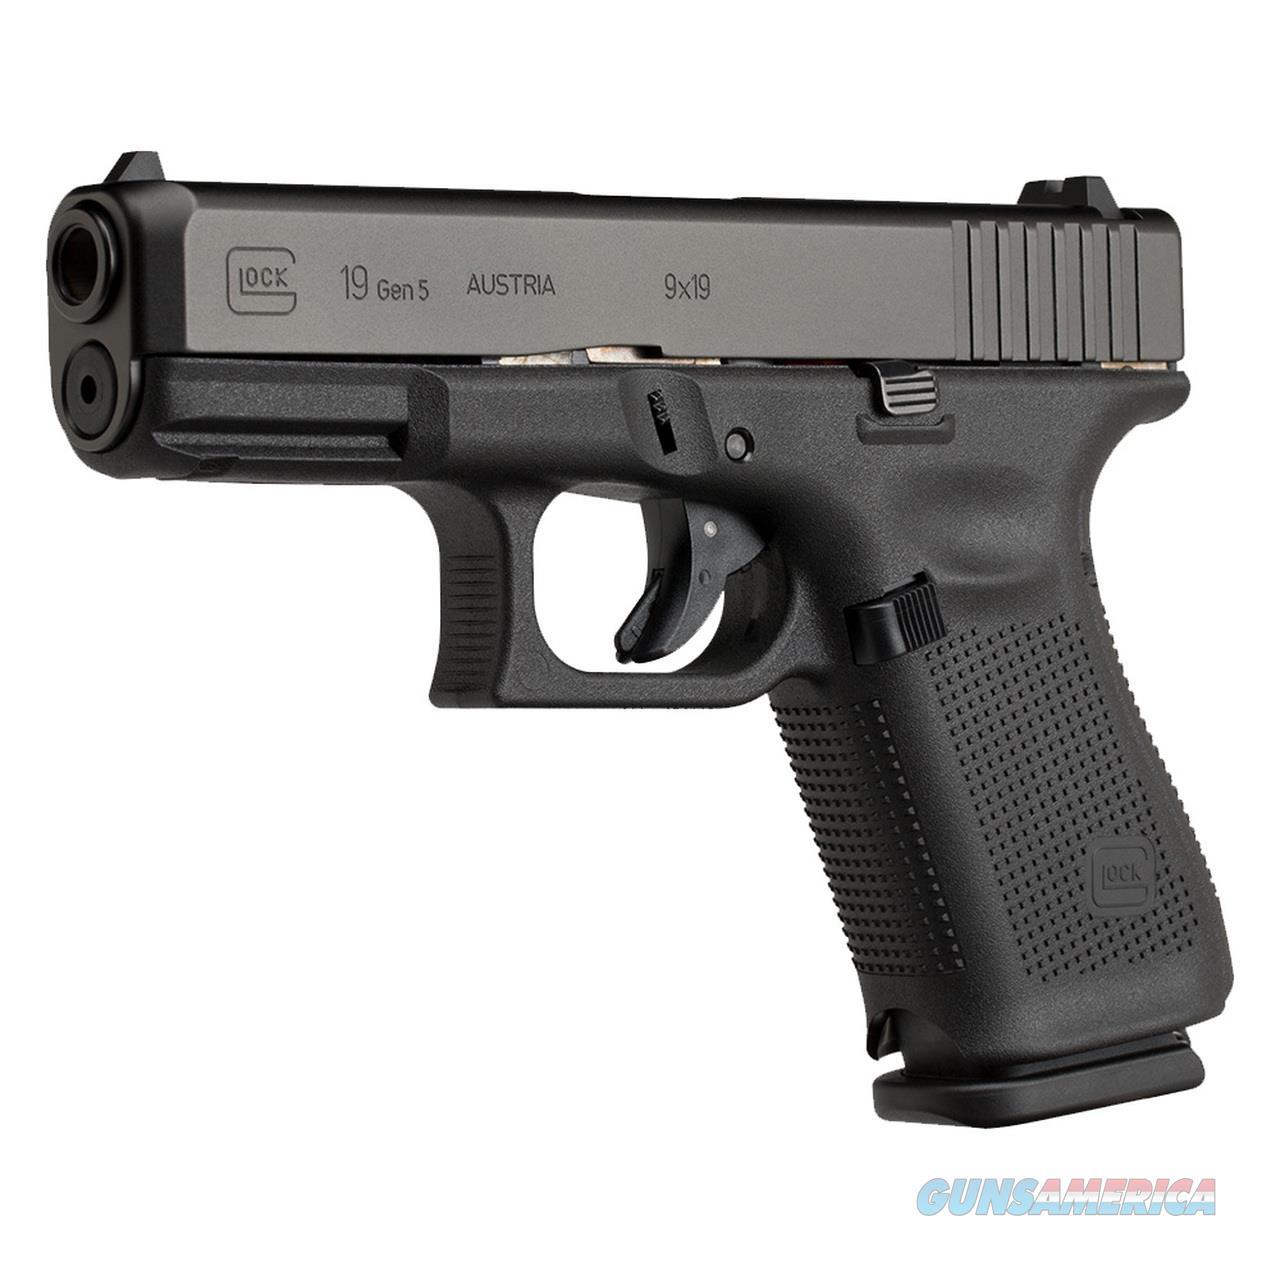 Glock 19 Gen 5, 9mm  Guns > Pistols > Glock Pistols > 19/19X